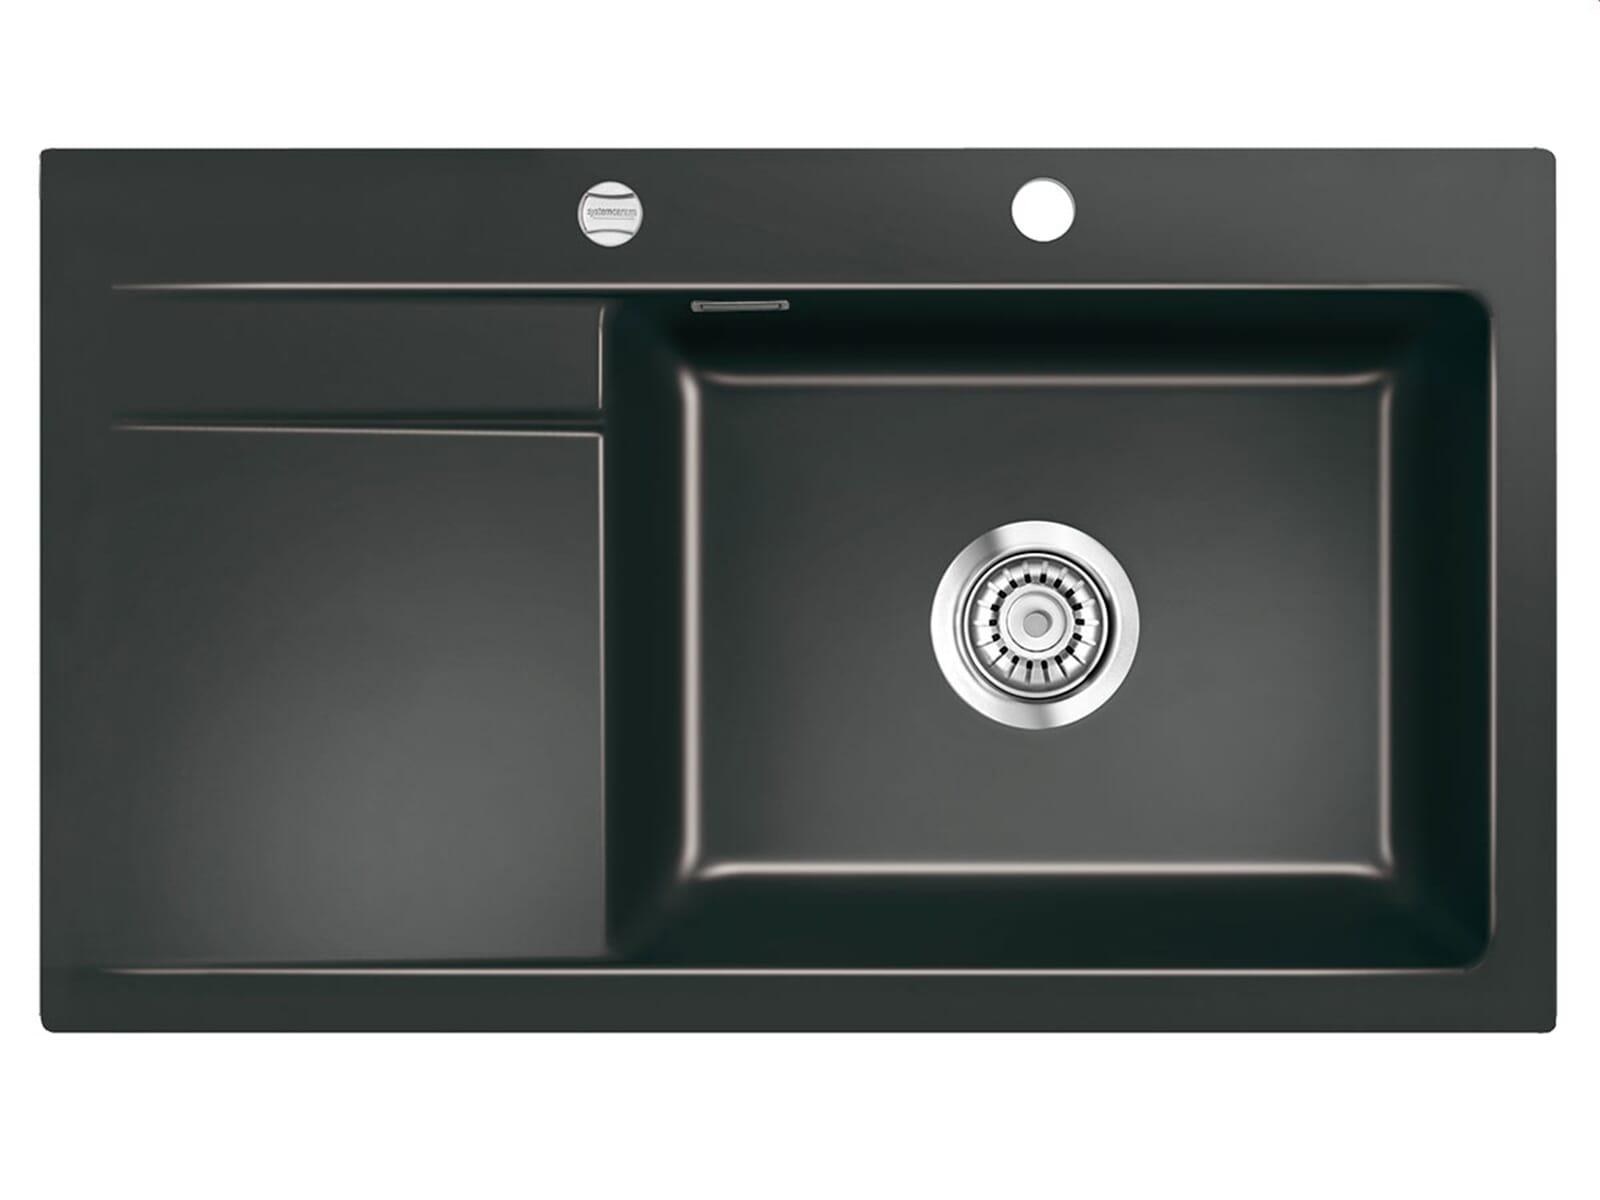 Systemceram Stema 86 SL Nero Keramikspüle Excenterbetätigung